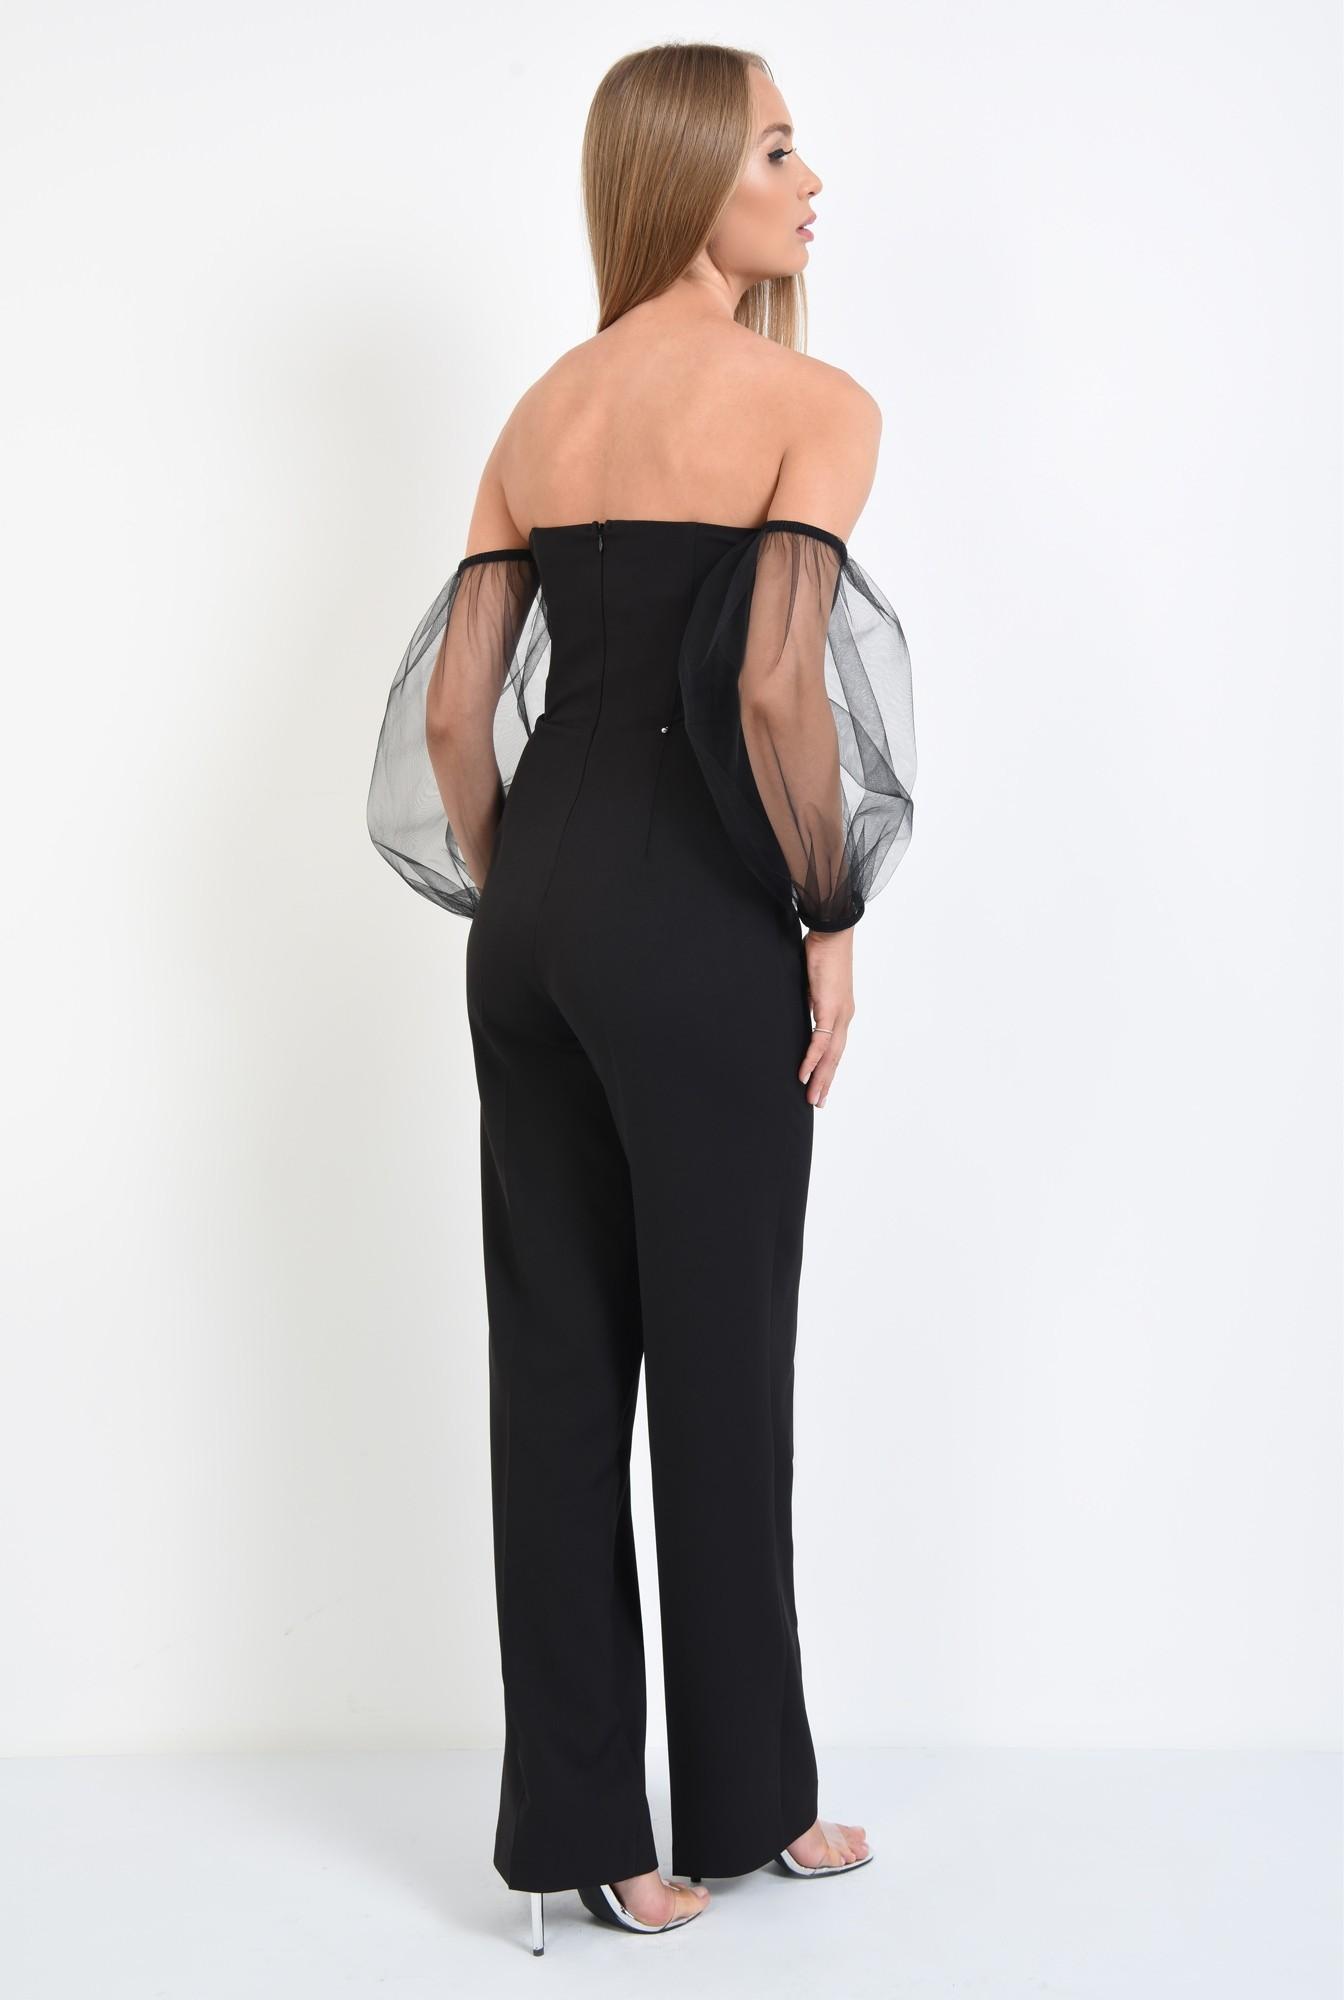 1 - salopeta eleganta, maneci tul, corset, centura decorativa